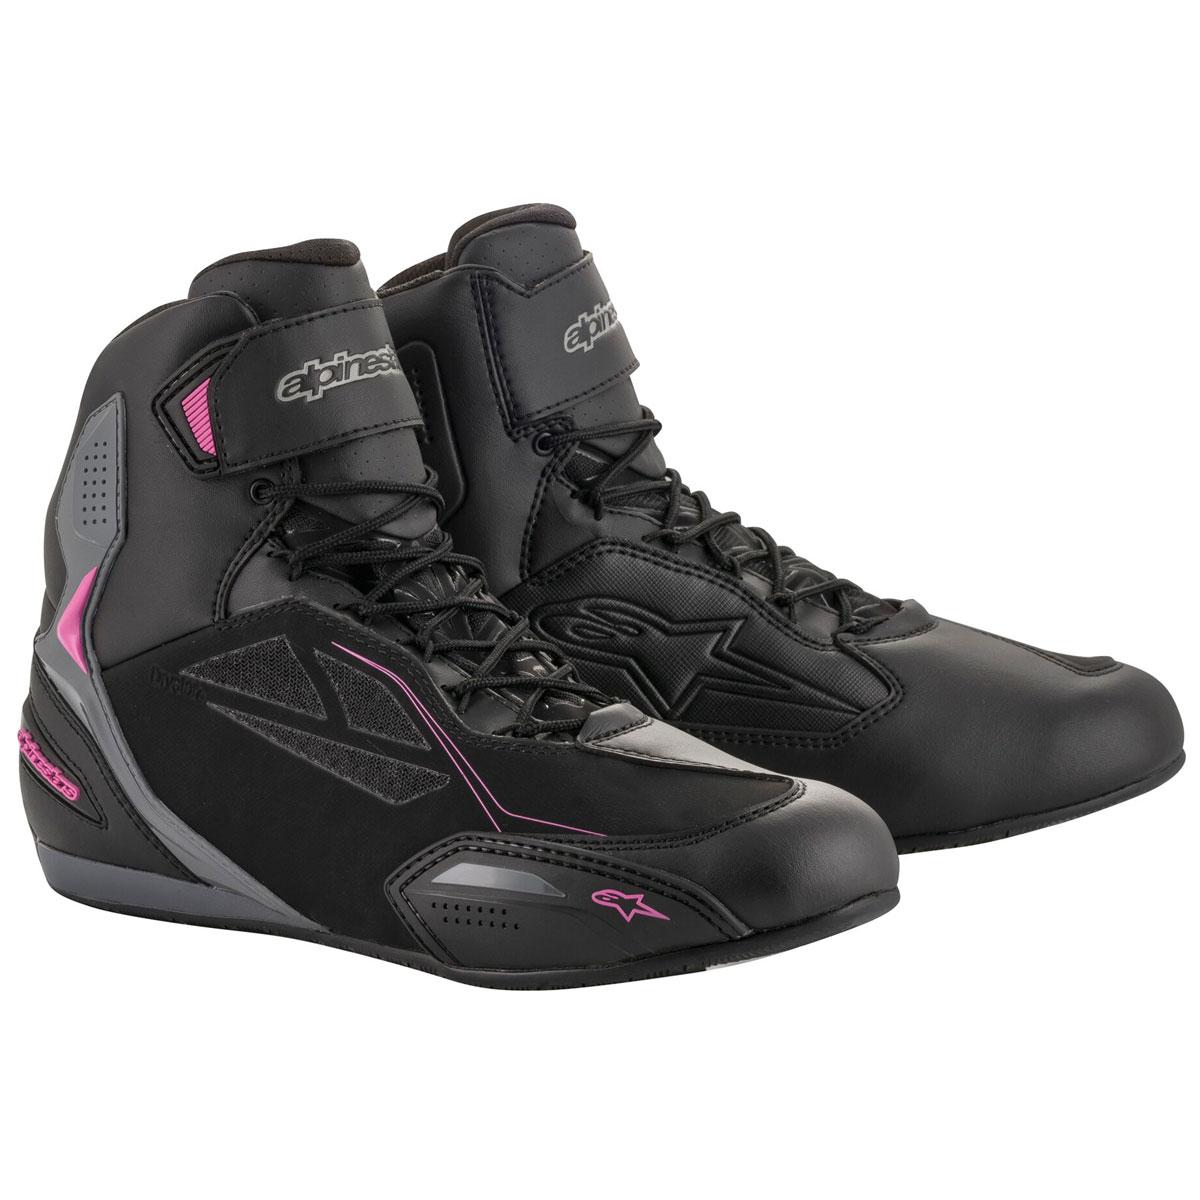 Alpinestars Women's Stella Faster-3 Drystar Black/Fuchsia Boots